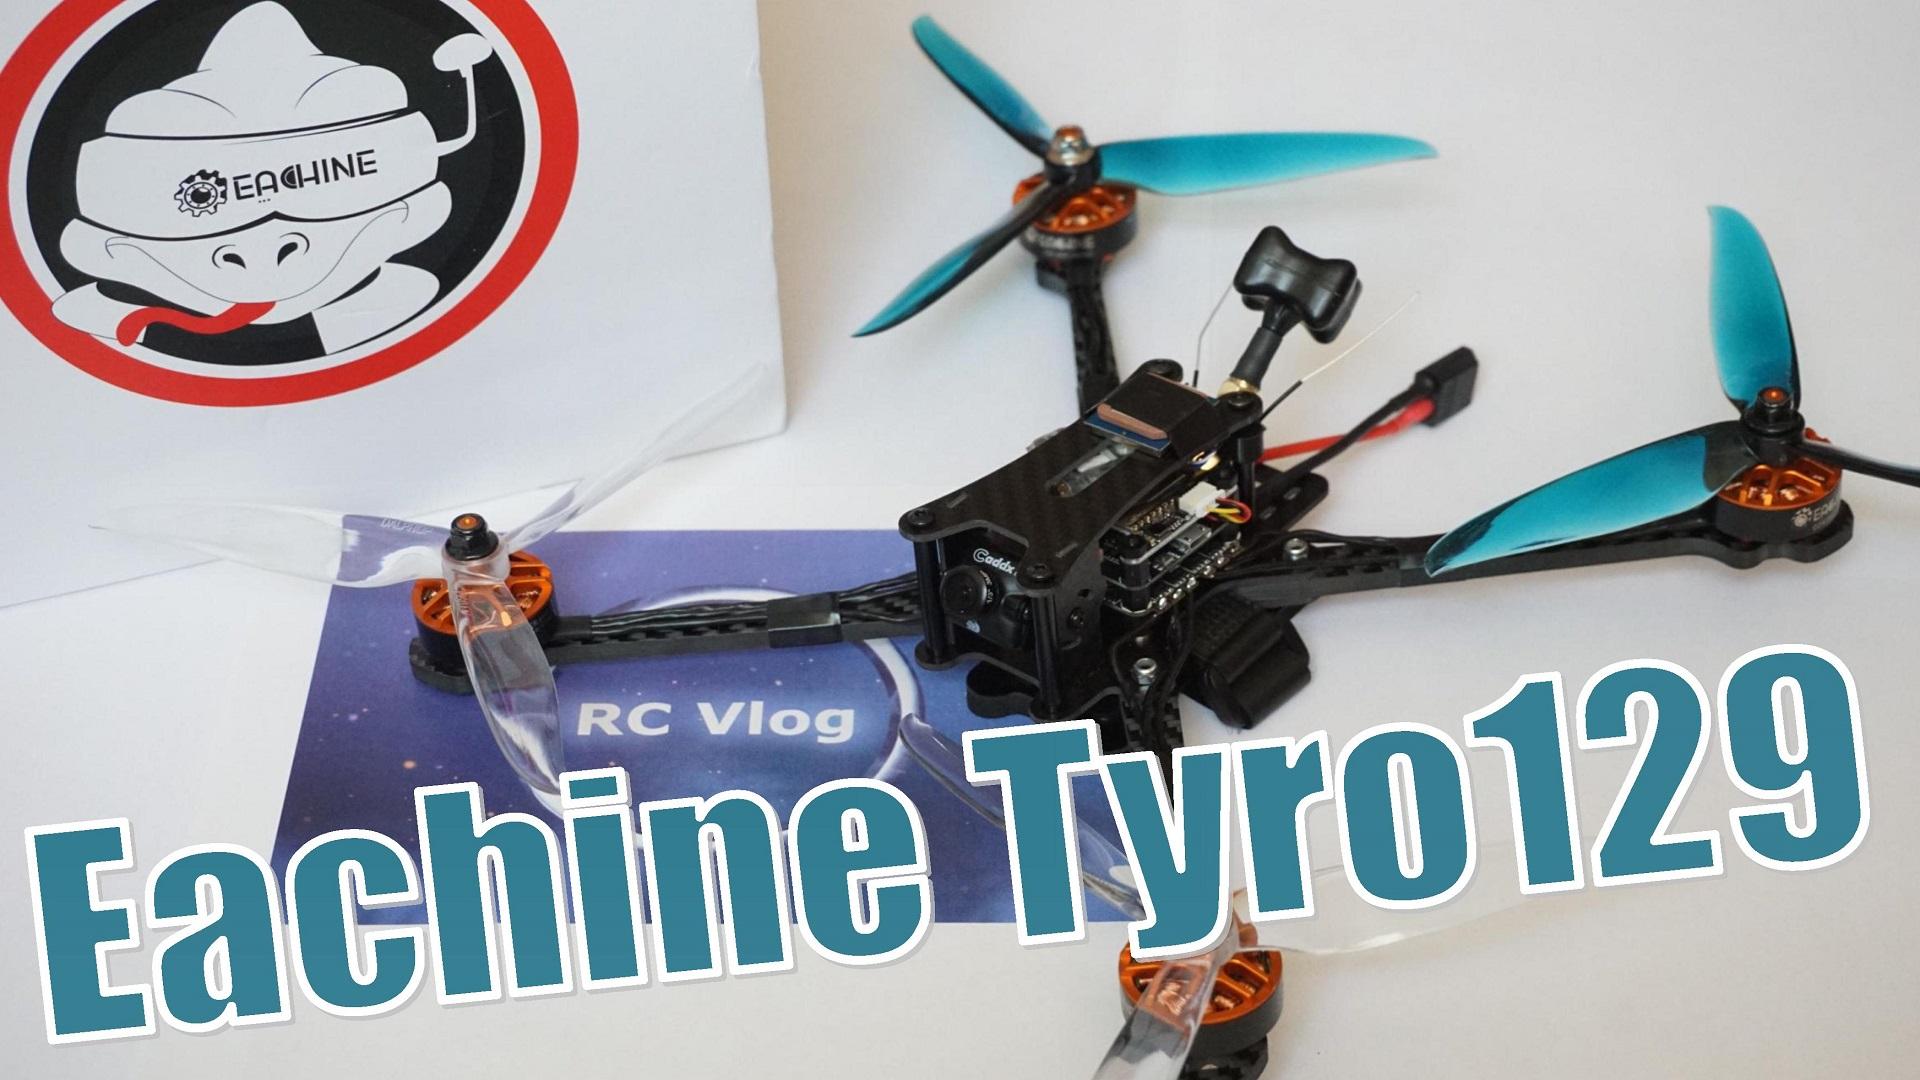 Eachine Tyro129